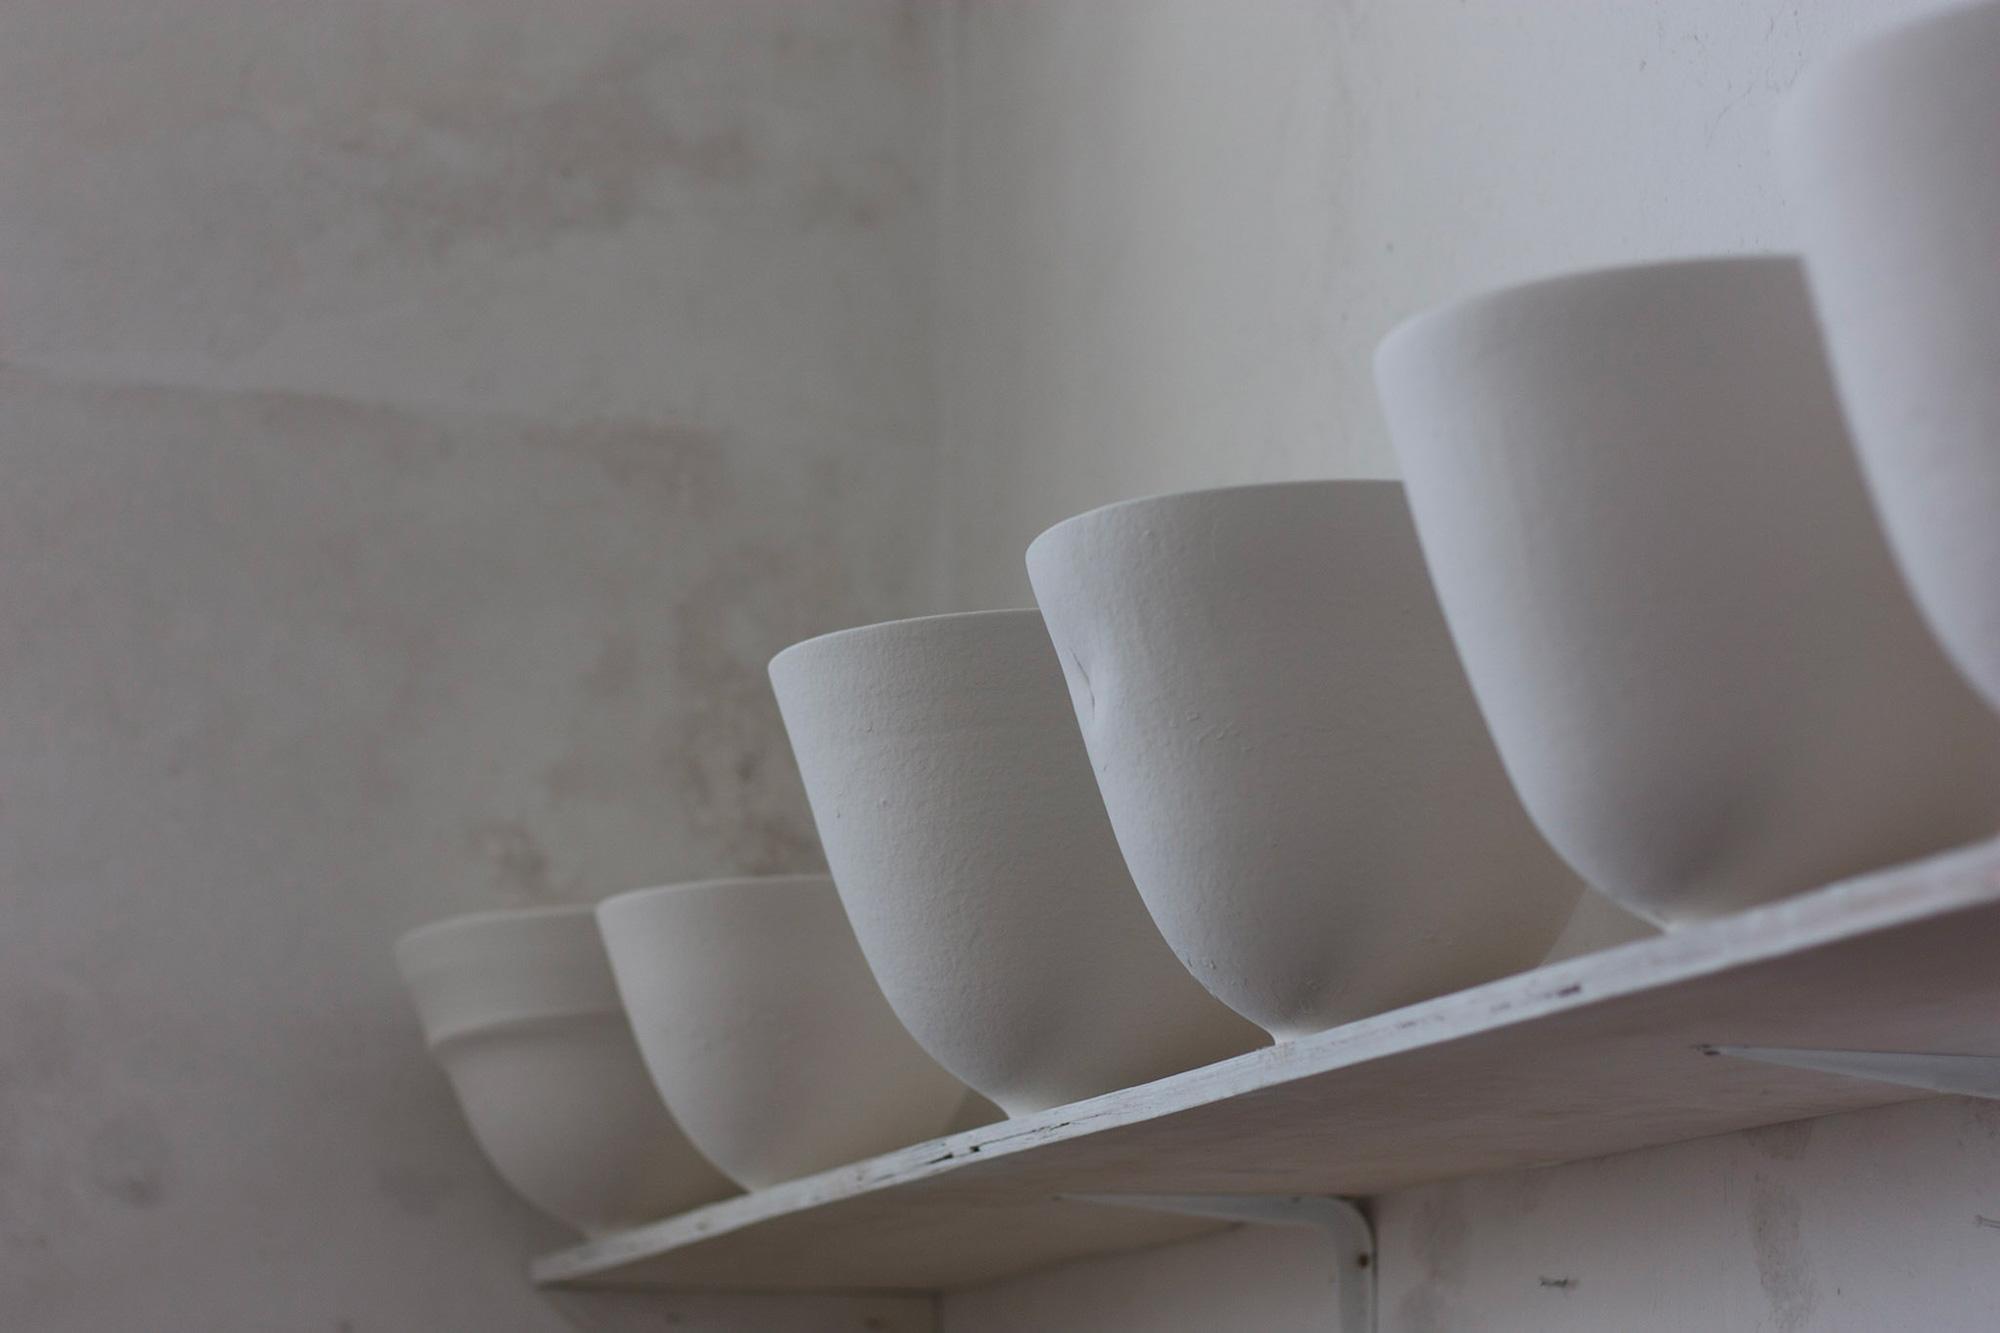 doherty-porcelain-new-studio-studio-04.jpg